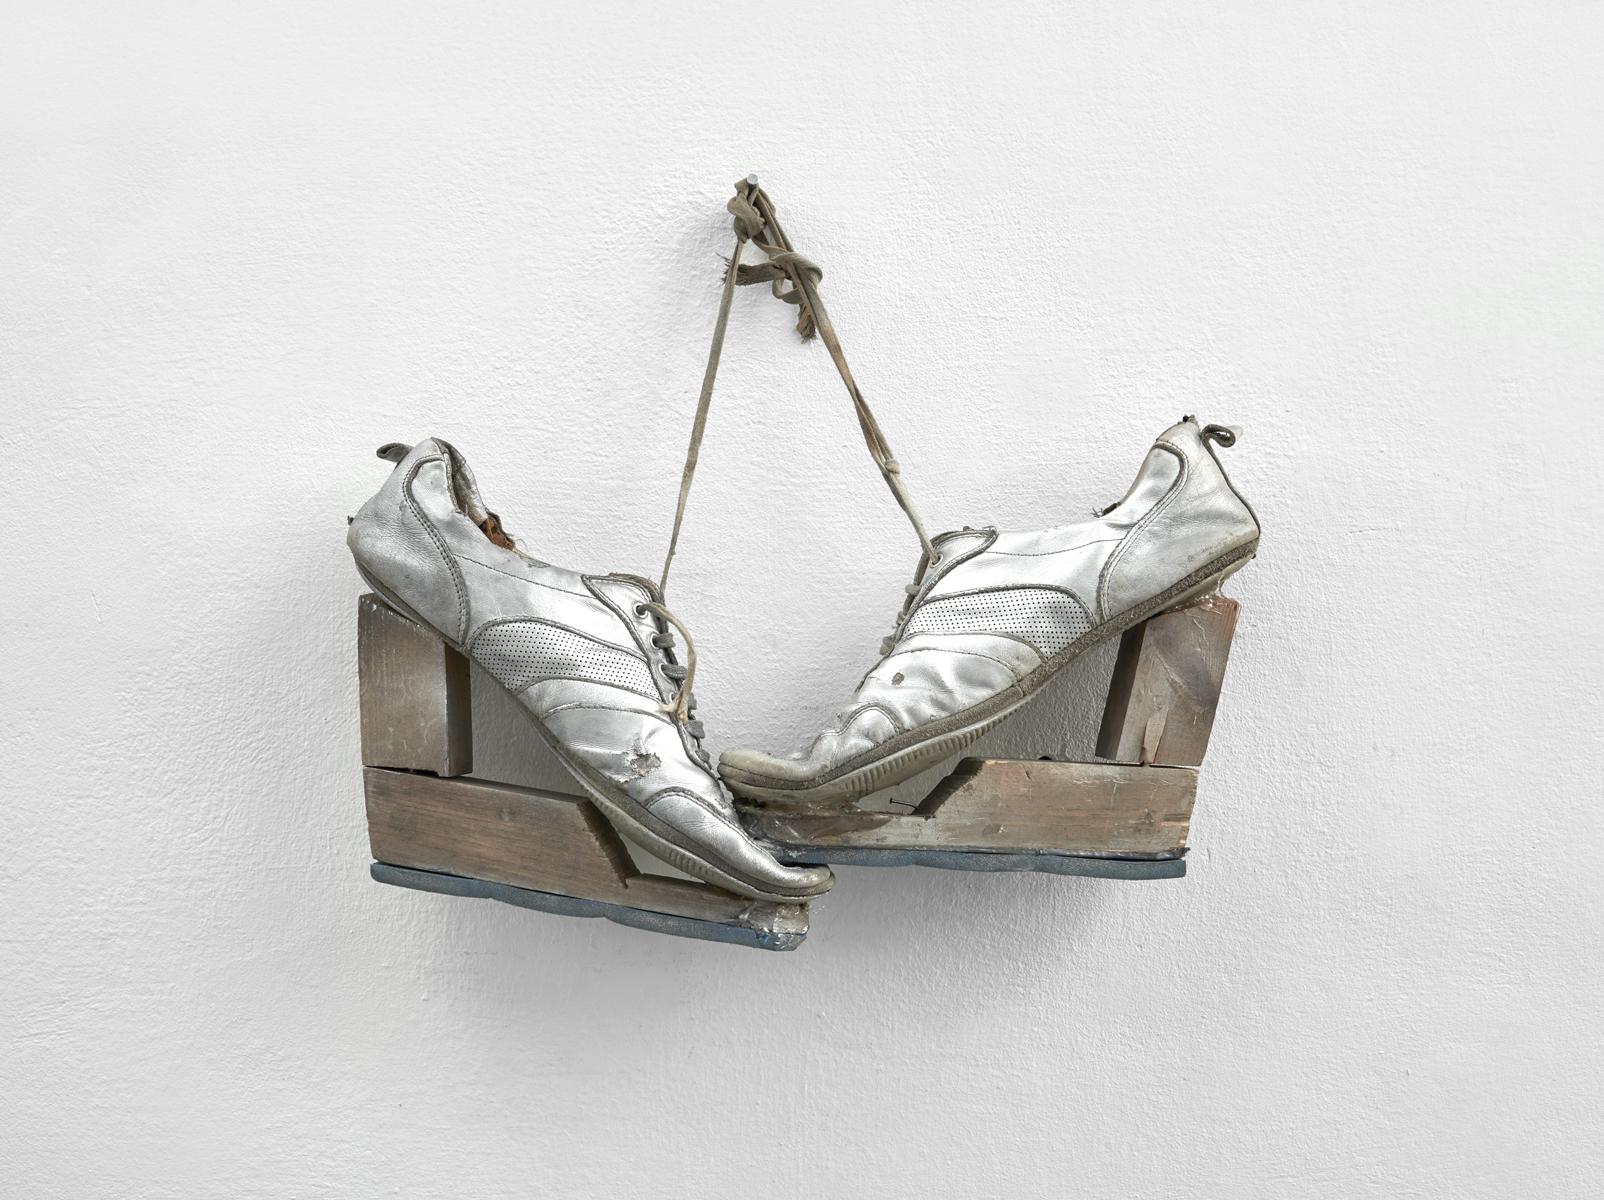 ACTUS PURUS / Urgent need to be on heels / 2016 / 52 x 41 x 8 cm / trainers, wood, pouliretan foam